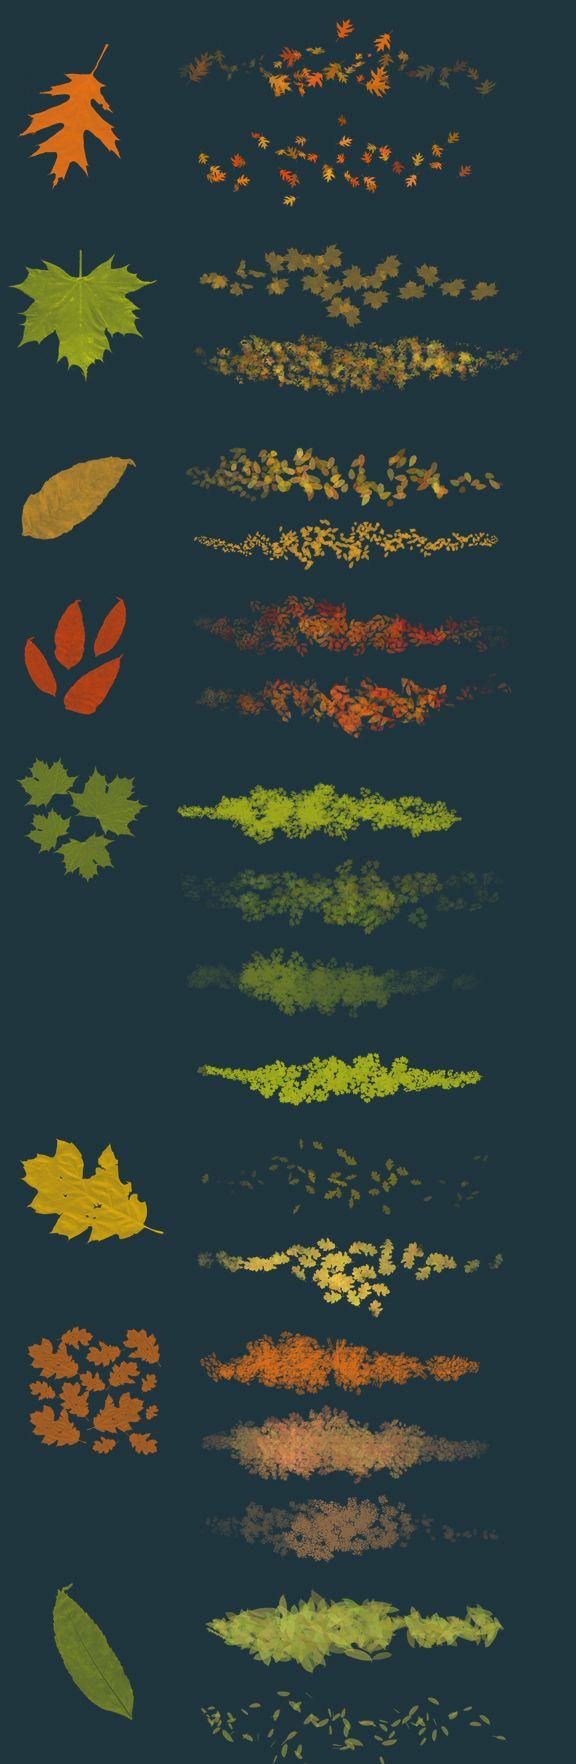 Leaves - photoshop brushes by streamline69.deviantart.com on @deviantART